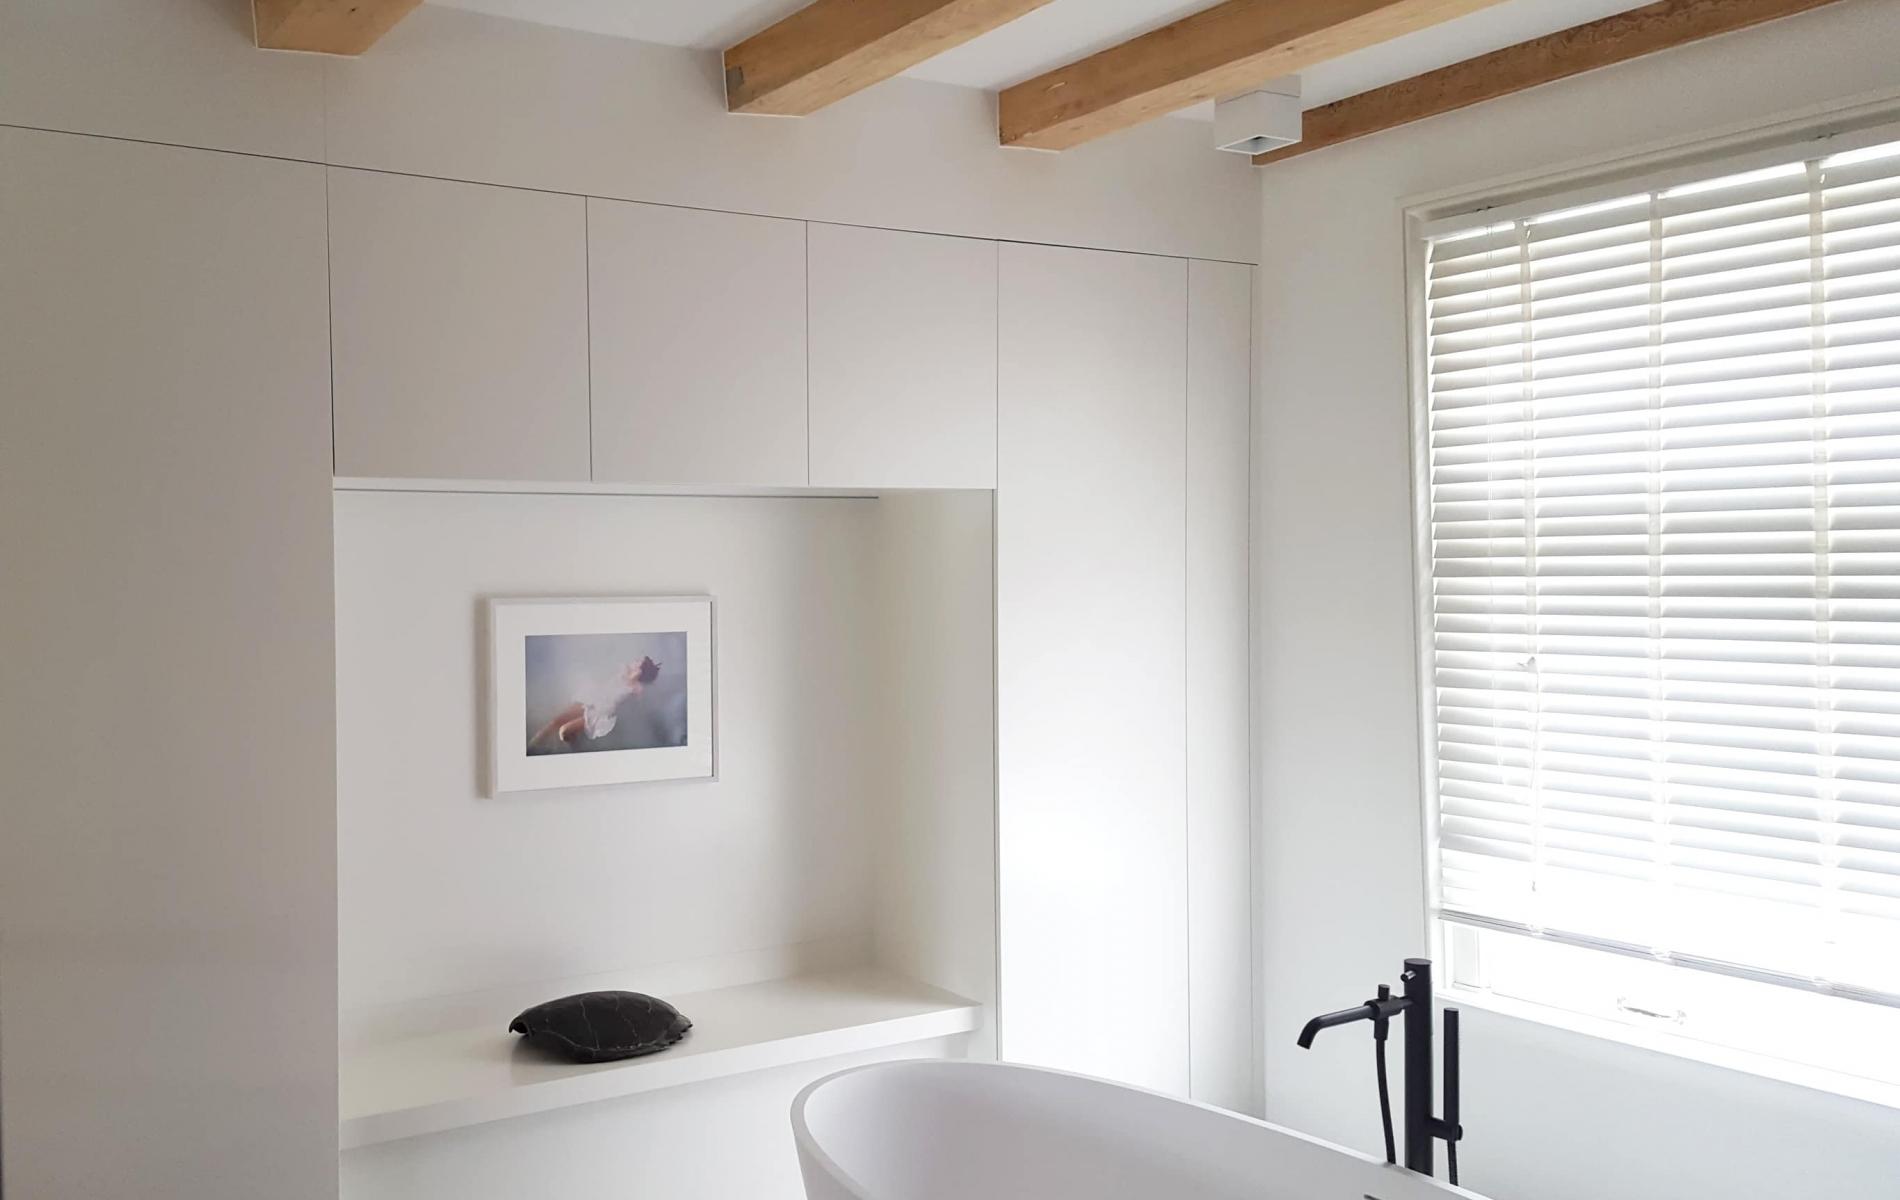 nielsmaakt-badkamer-1